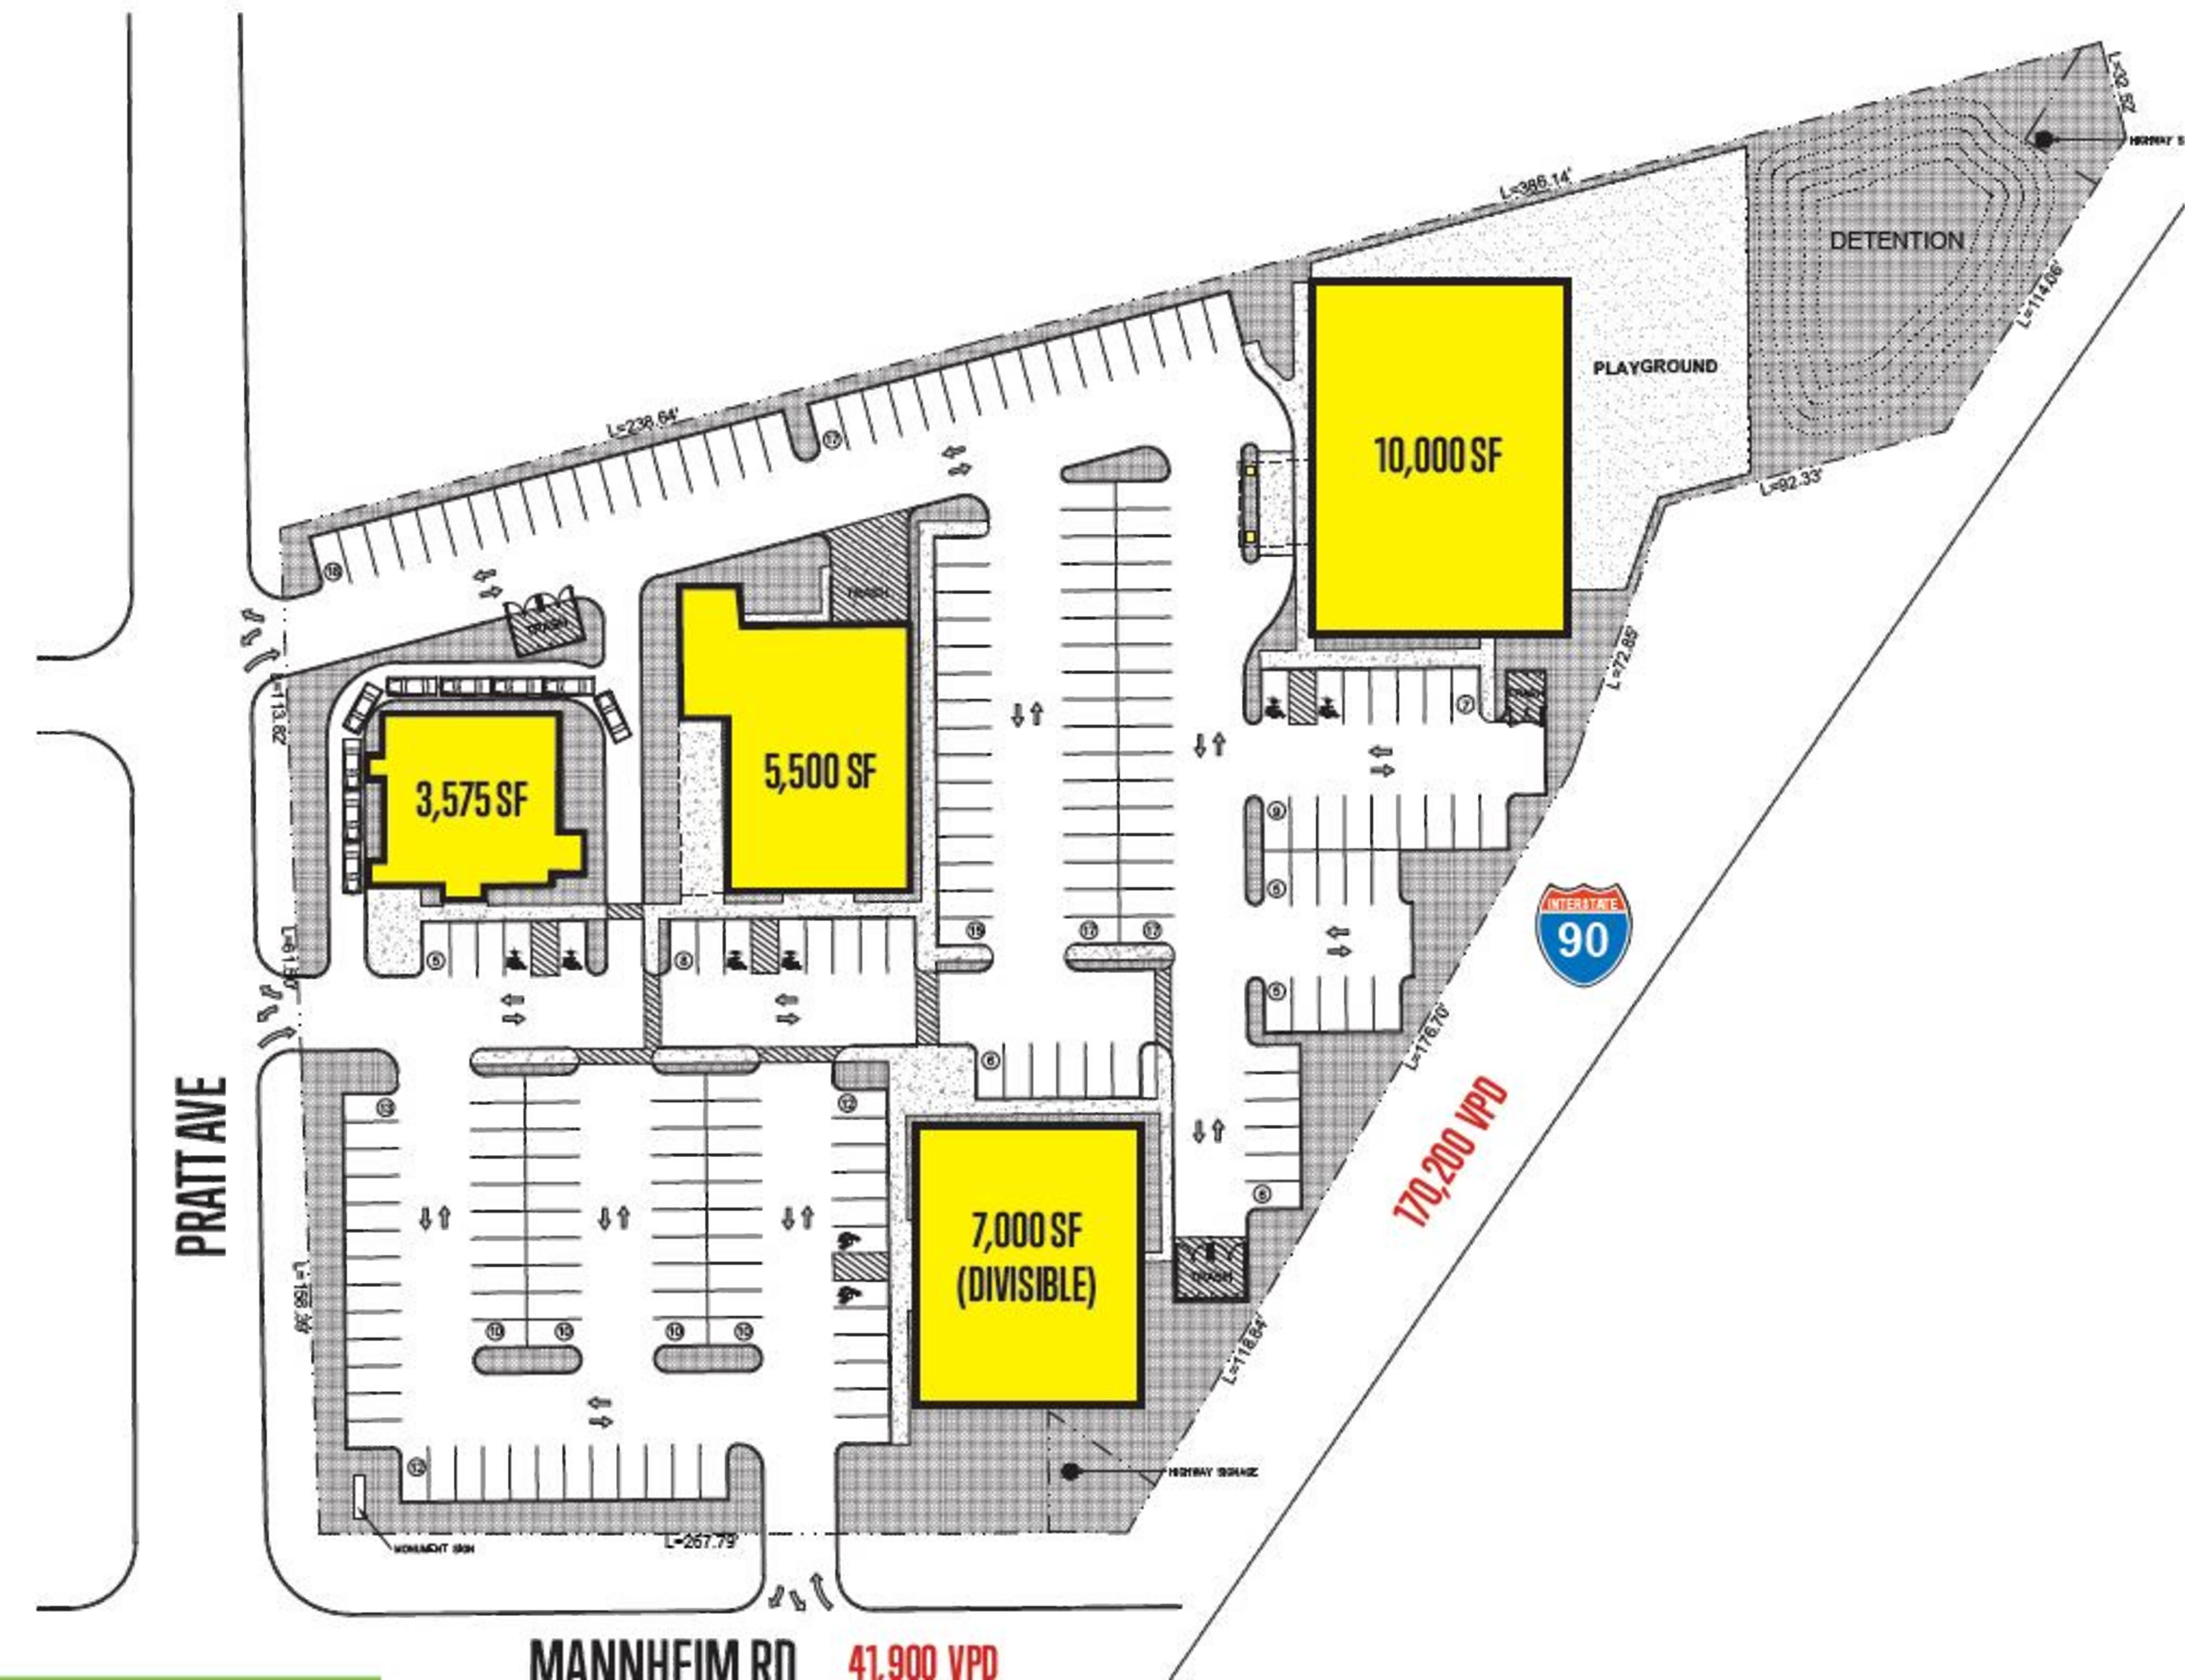 Mannheim & Pratt: site plan